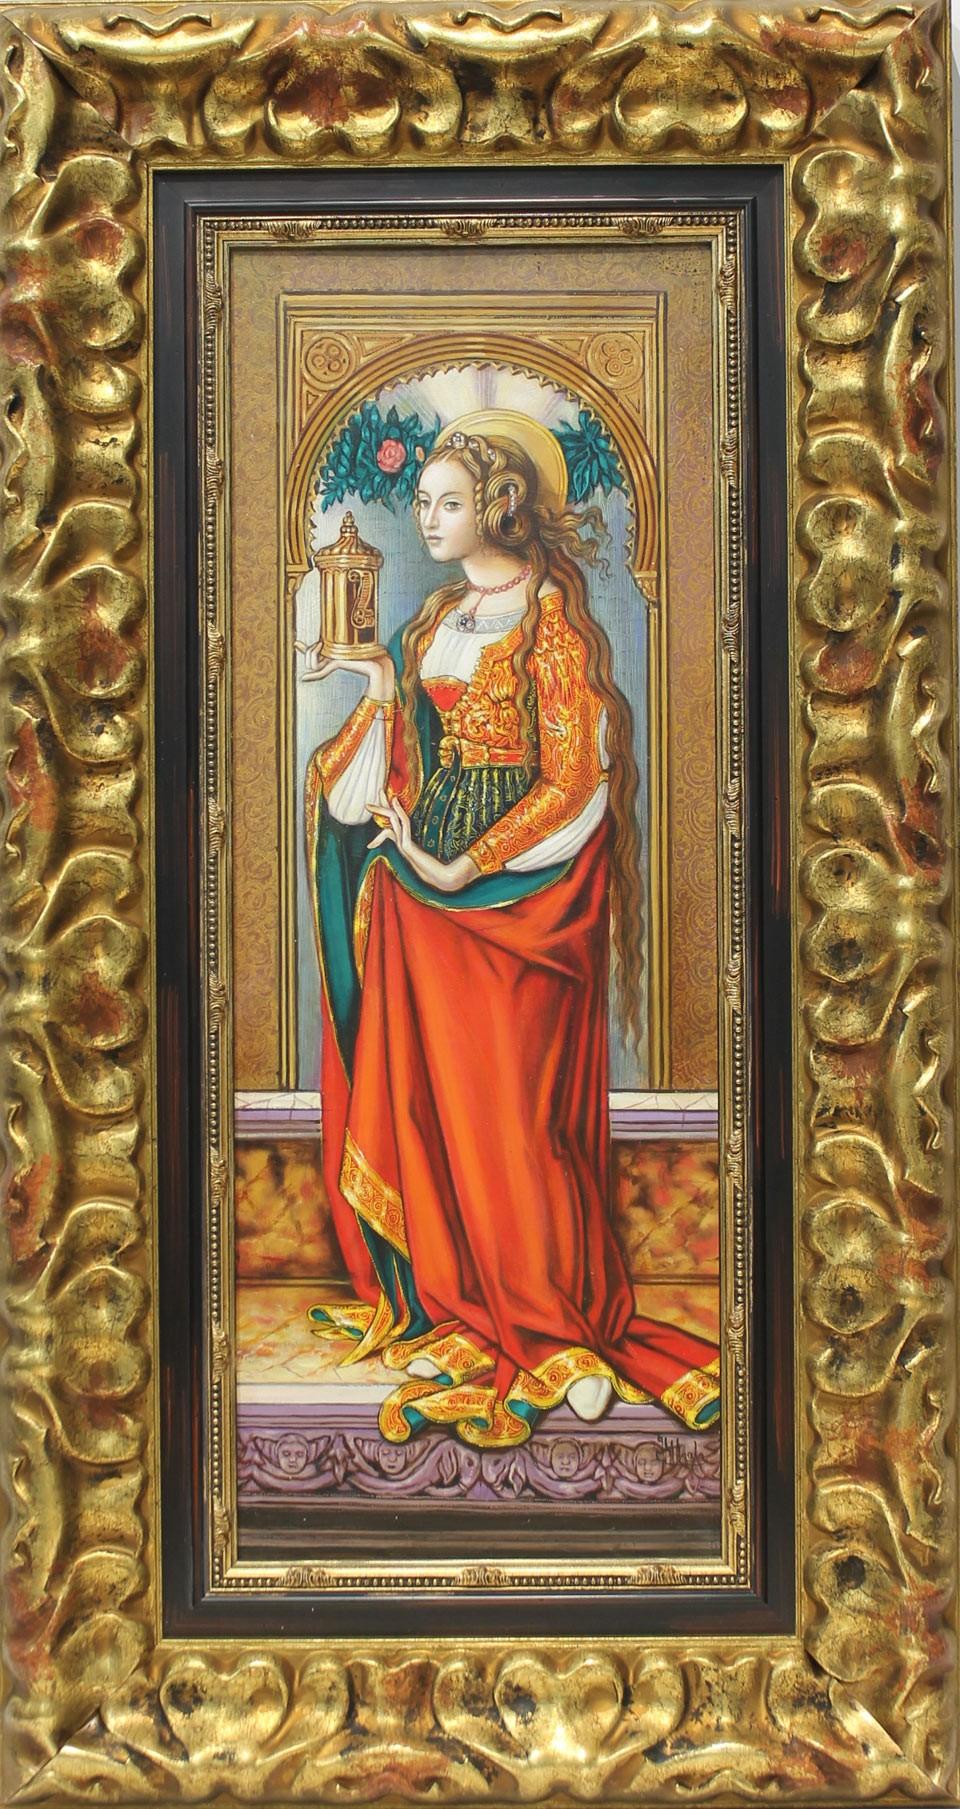 Juan Manuel Ayala: María Magdalena gótica